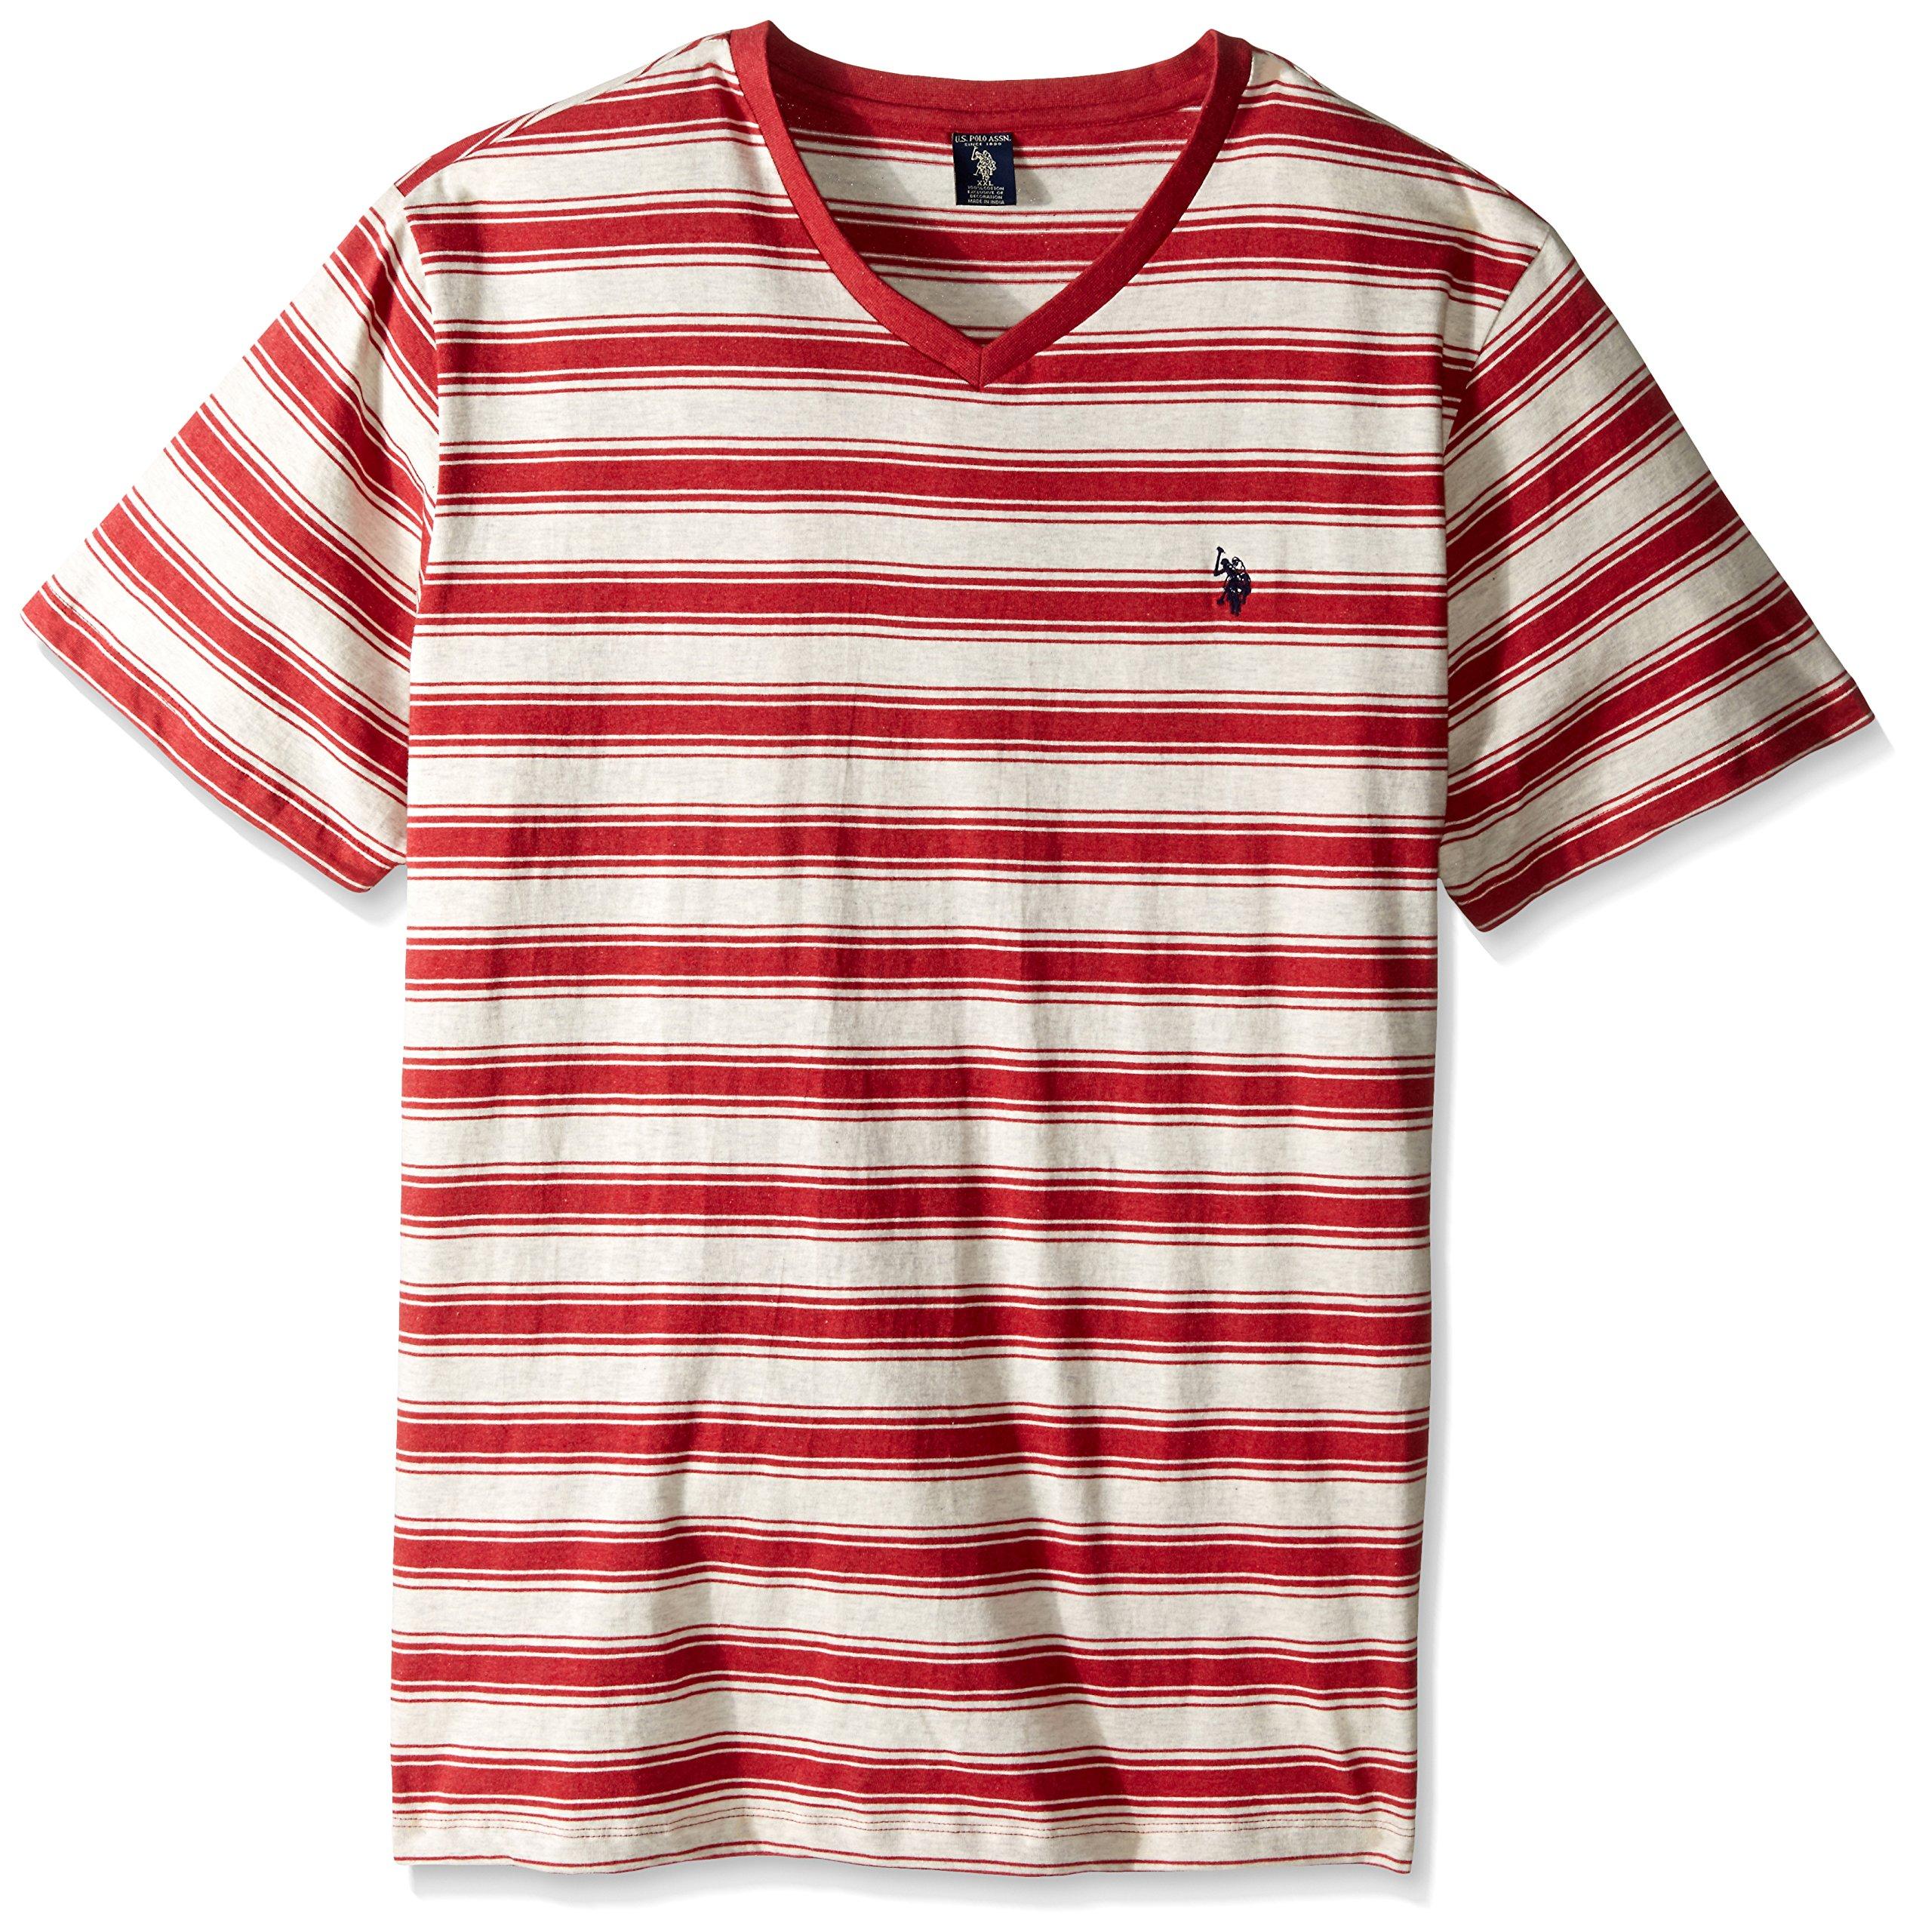 U.S. Polo Assn.. Men's Big-Tall Short Sleeve Shadow Stripe V-Neck T-Shirt, Red Heather, X-Large/Tall